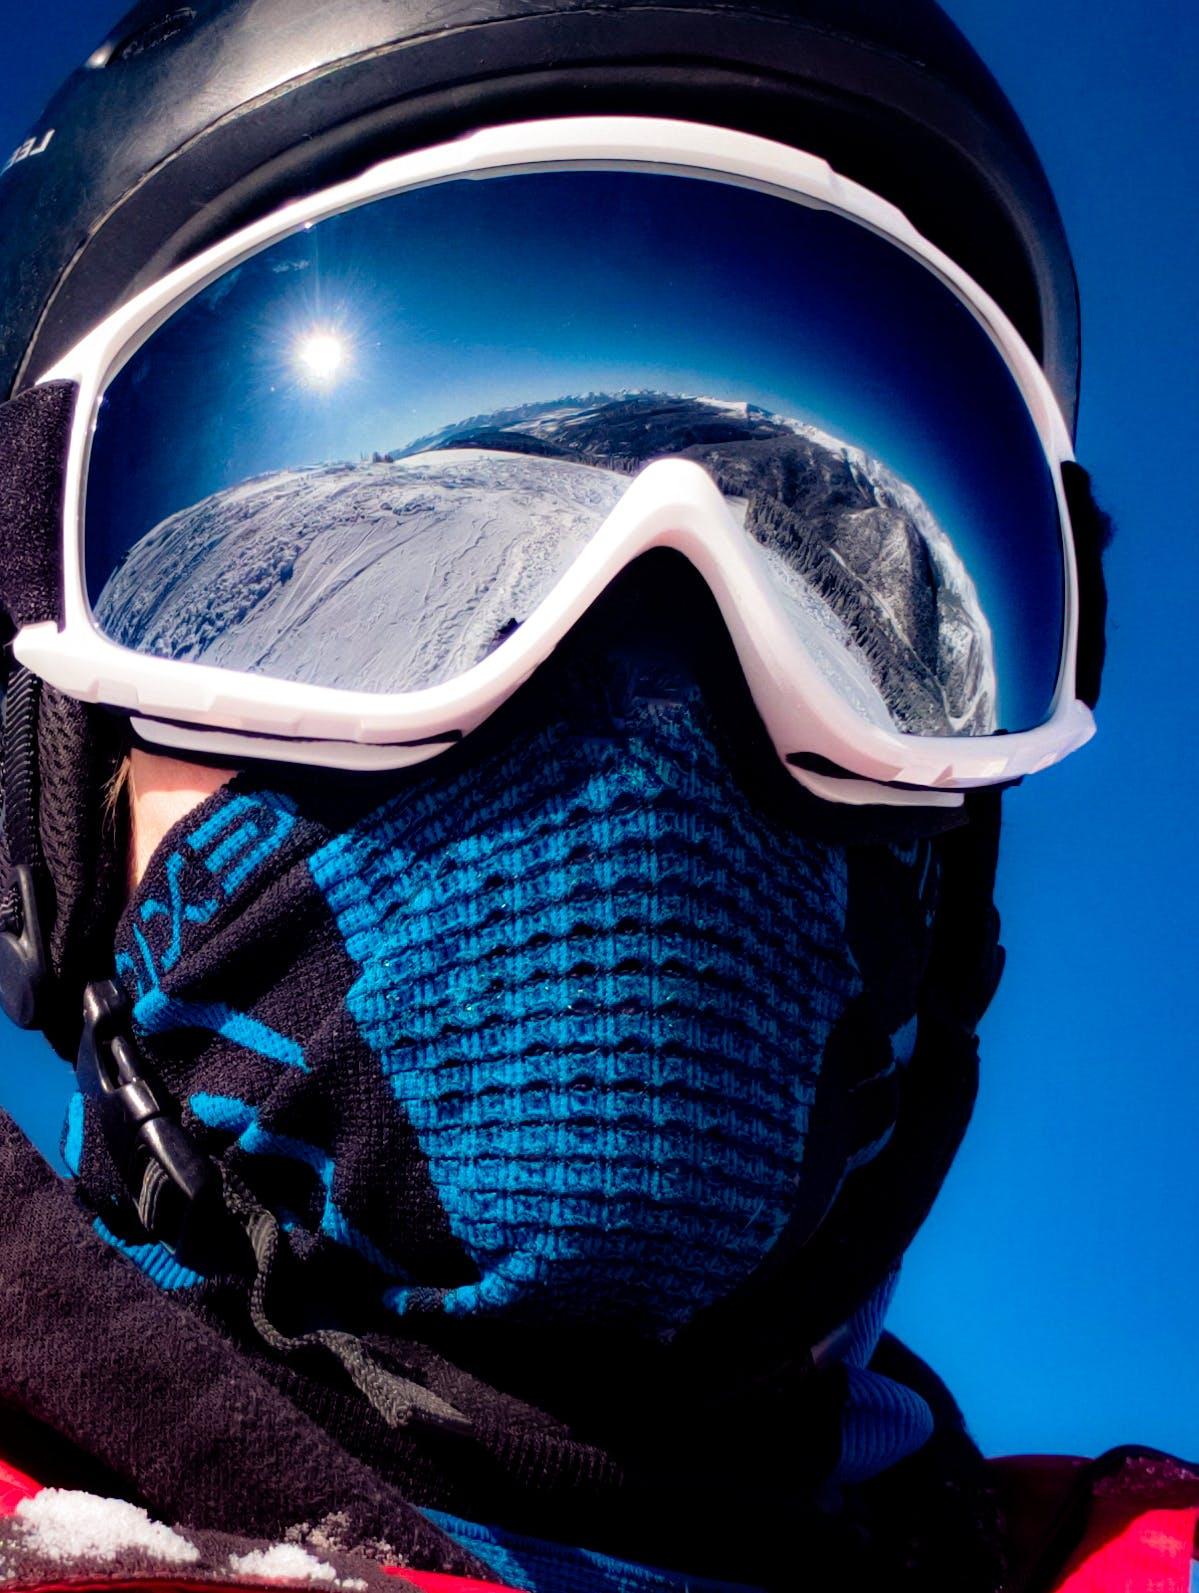 Winter Sports Expert Alex V.